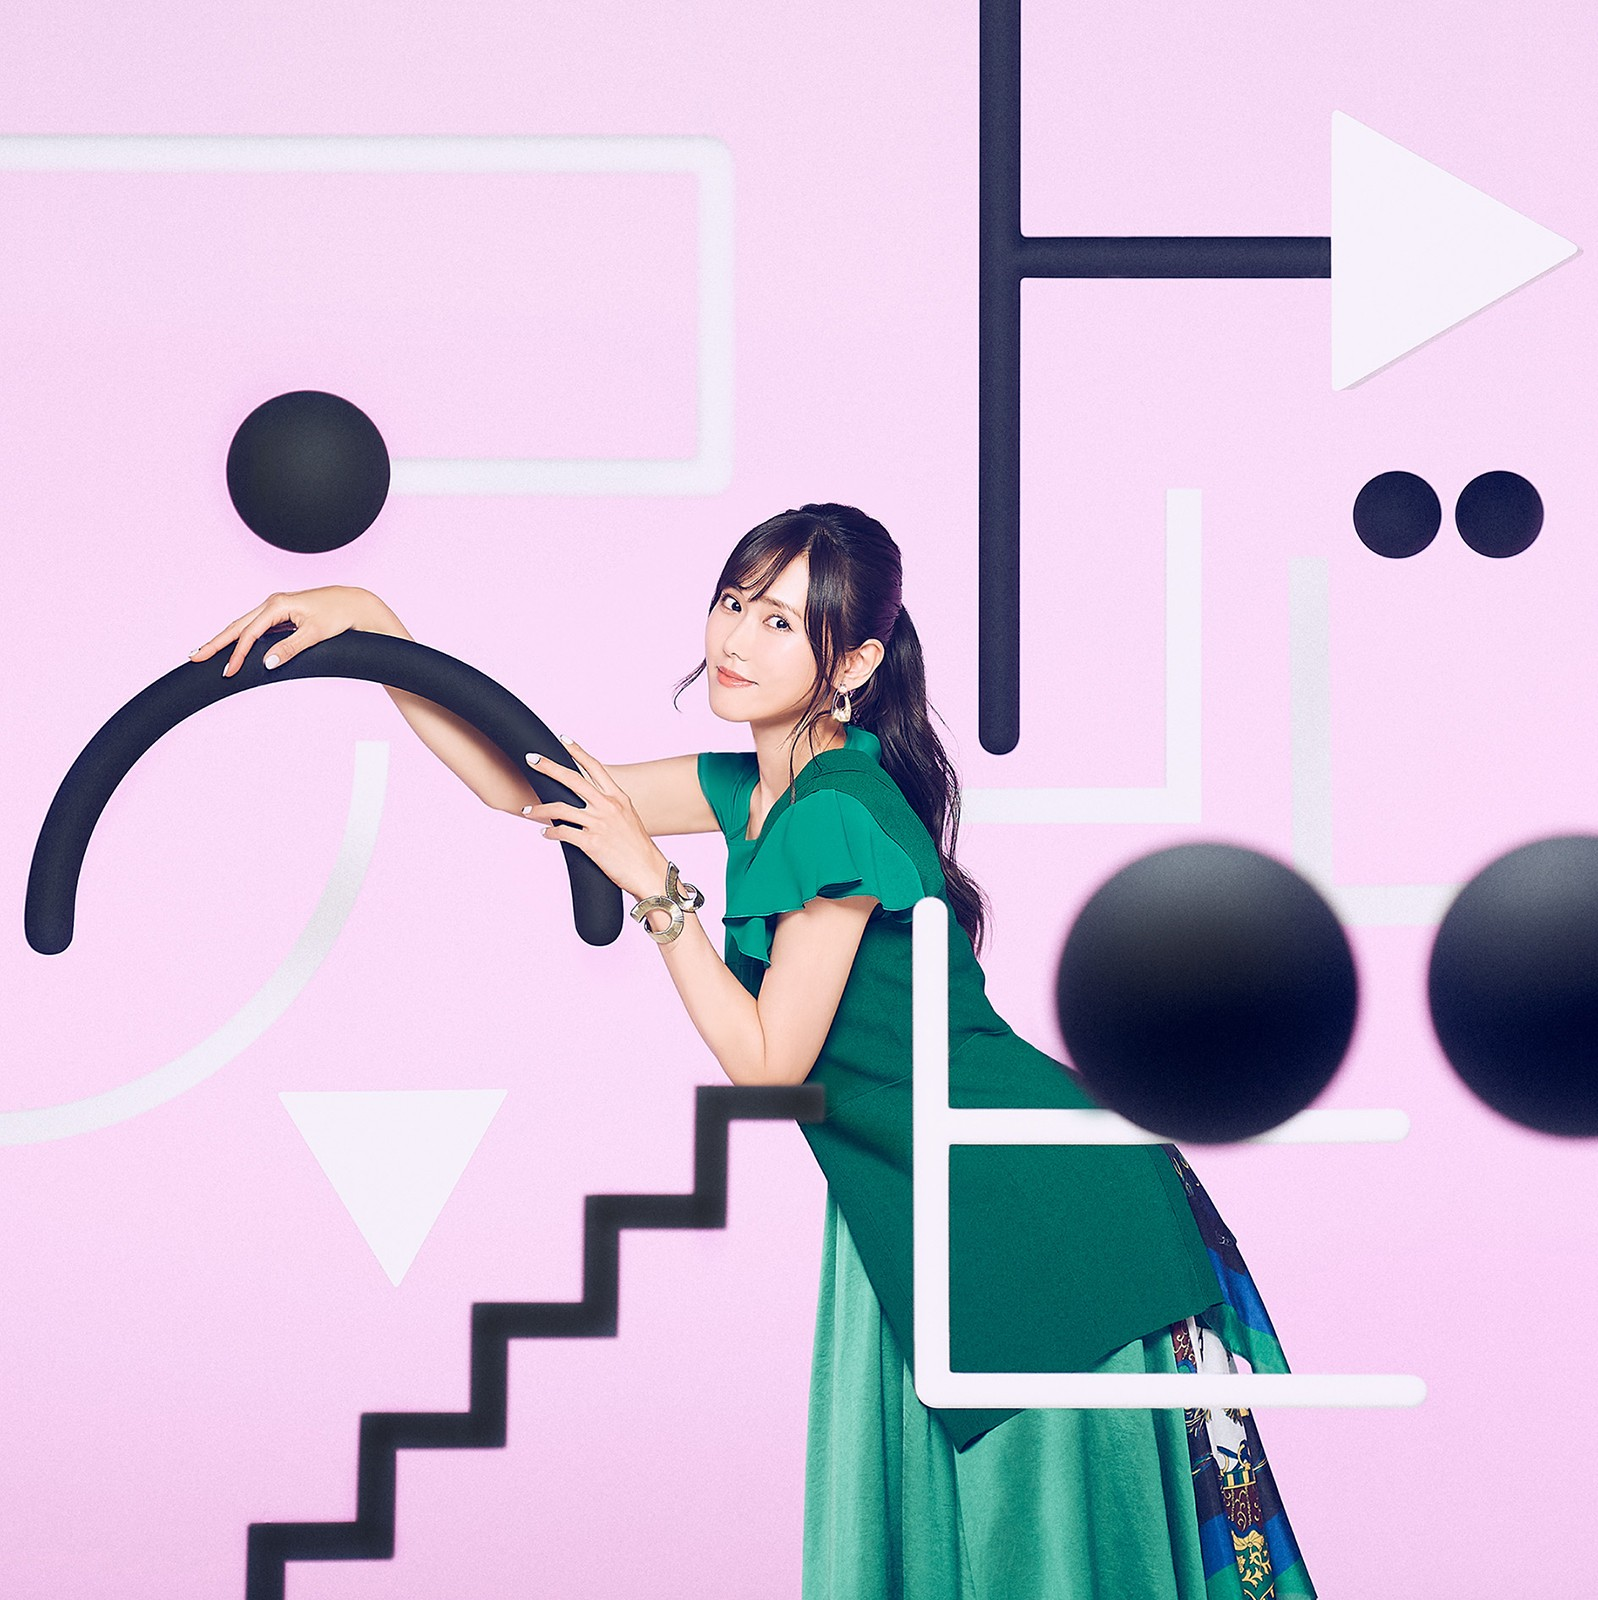 [Album] TRUE (唐沢美帆 / Miho Karasawa) – コトバアソビ [FLAC + MP3 320 / WEB] [2021.08.25]